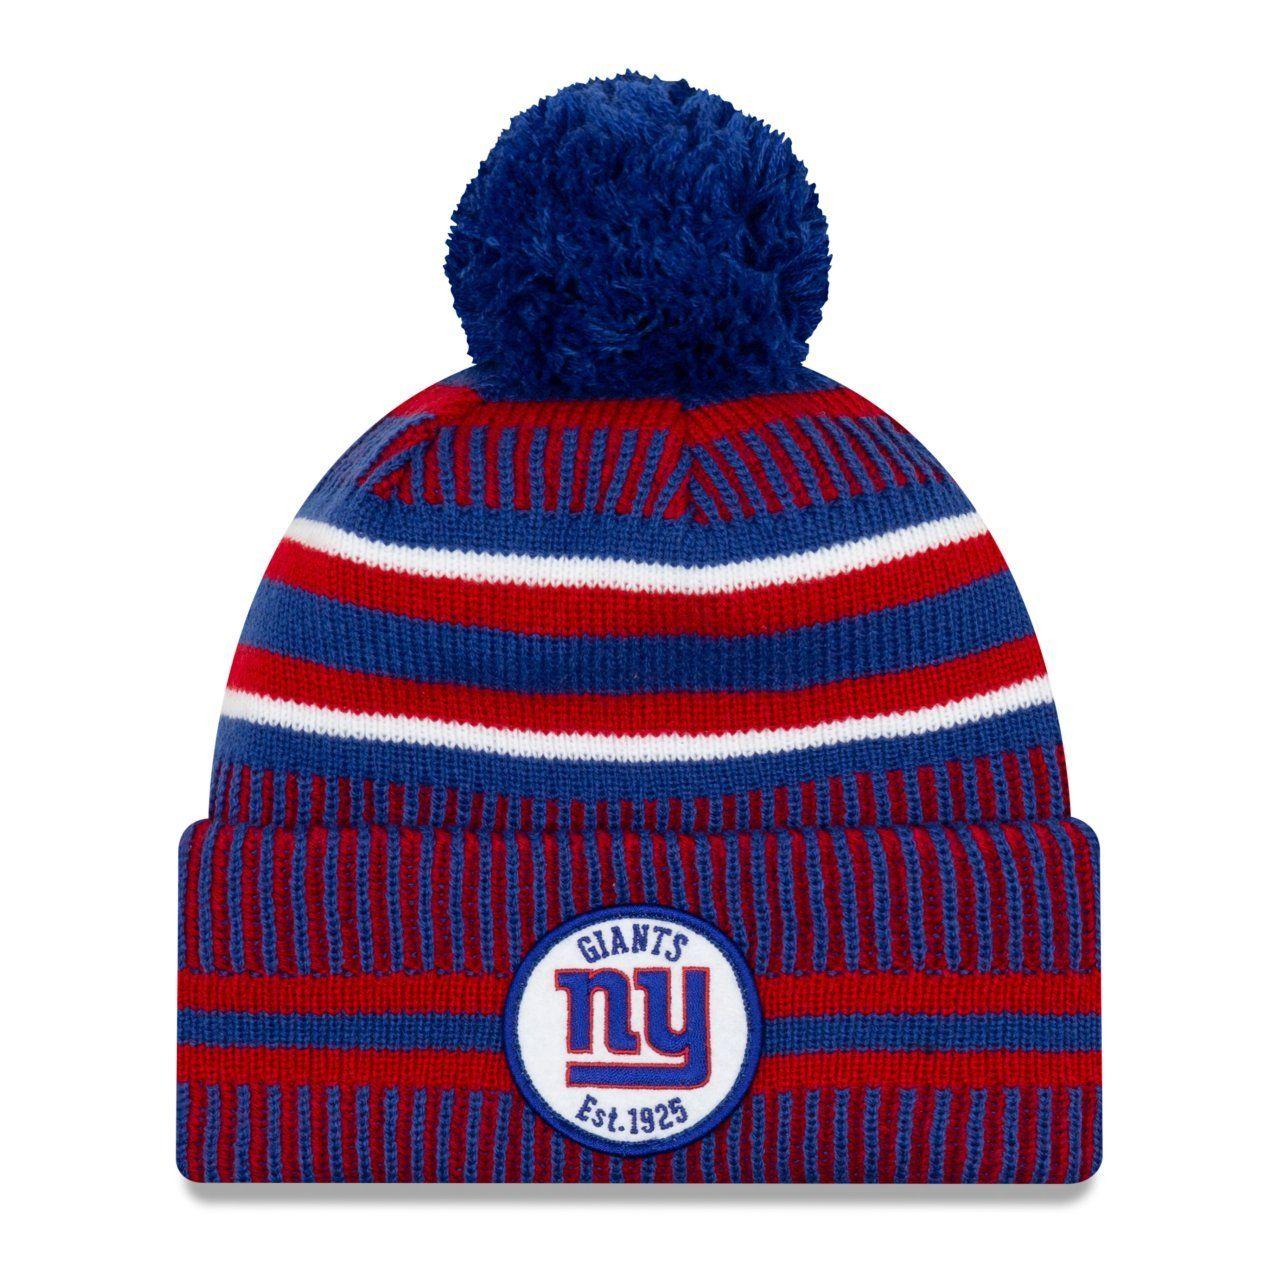 amfoo - New Era Sideline Bommel Kinder Mütze Youth New York Giants